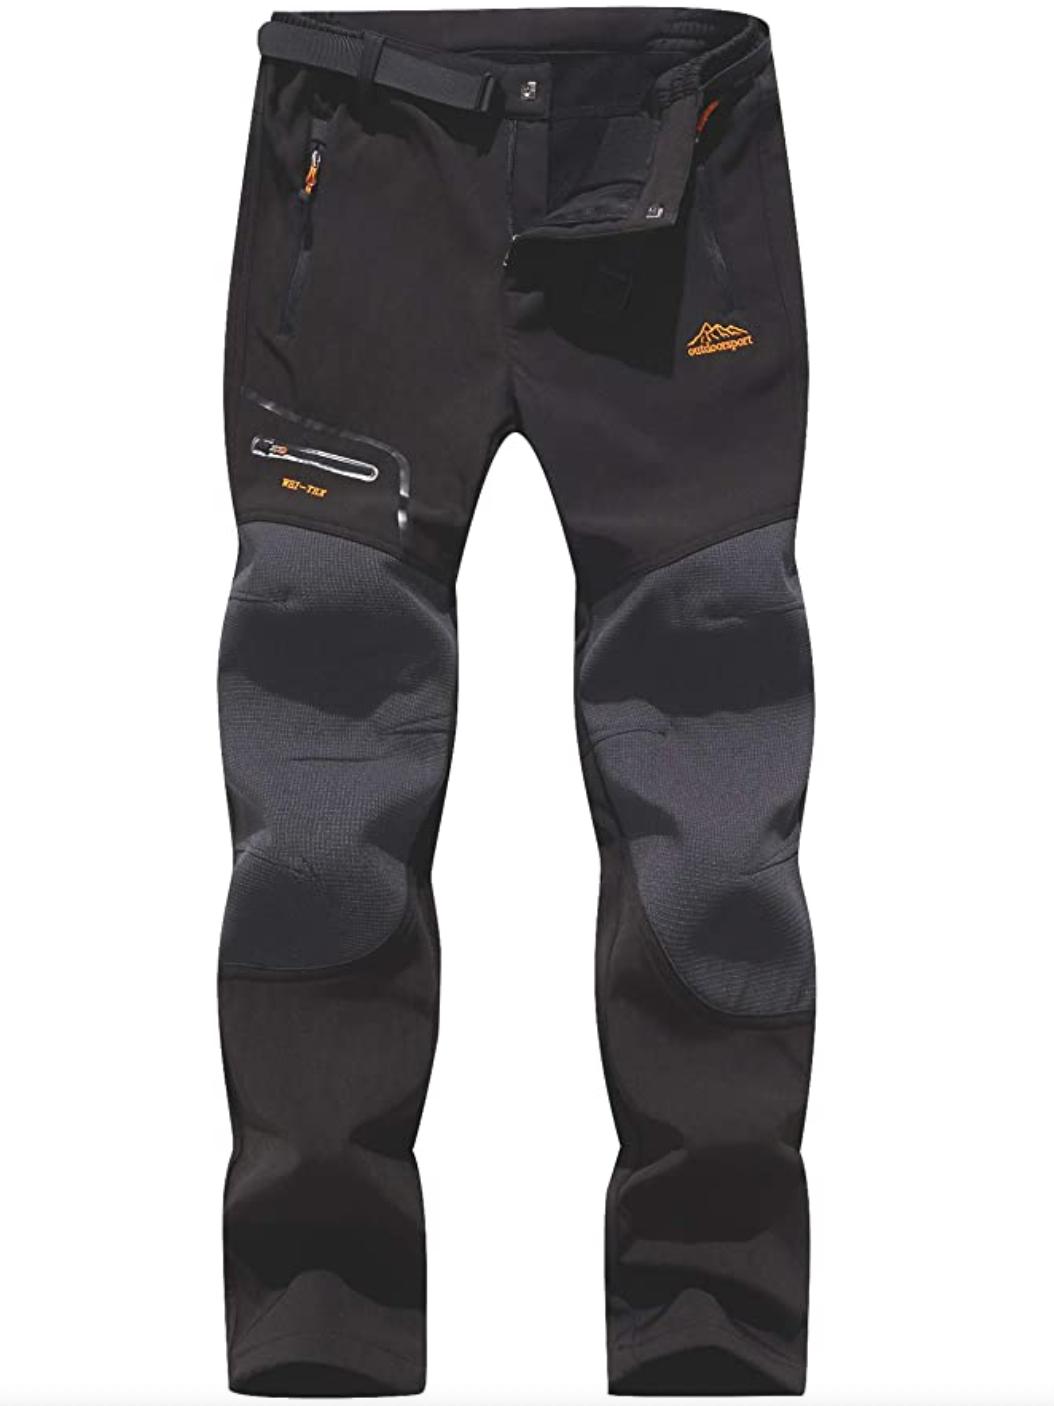 BenBoy Waterproof Cargo Hiking Pants